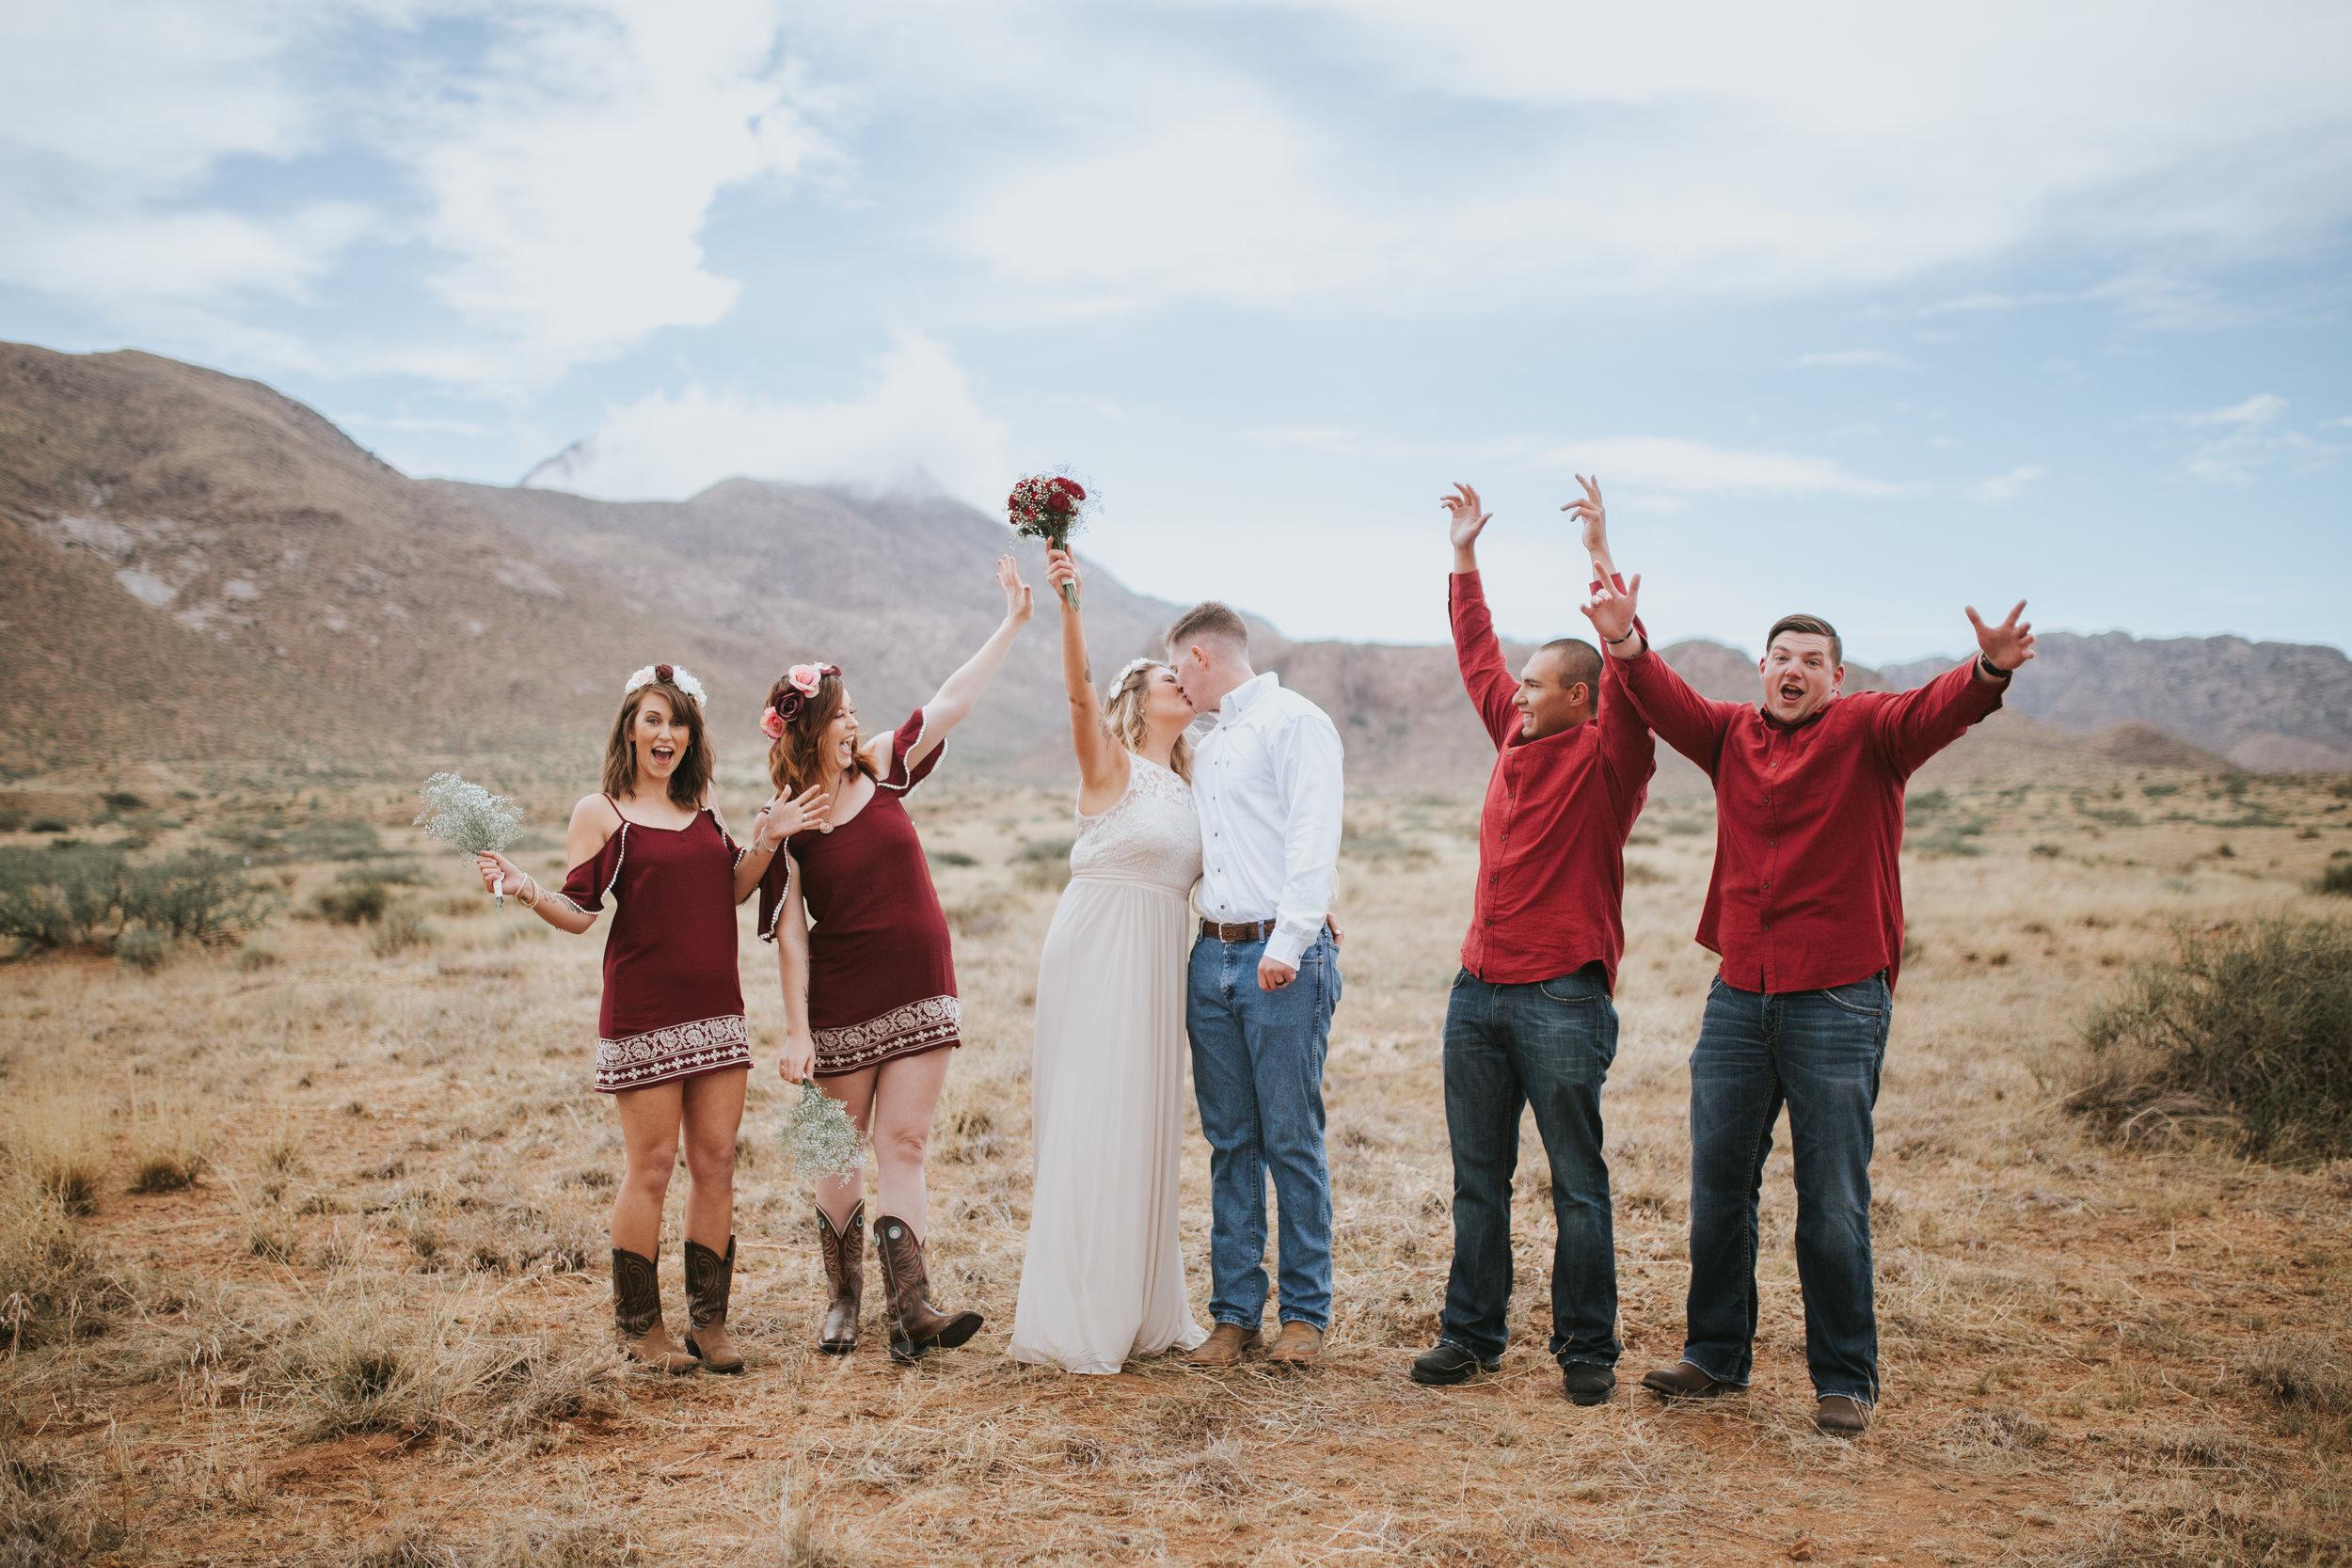 el-paso-texas-wedding-photographer-26